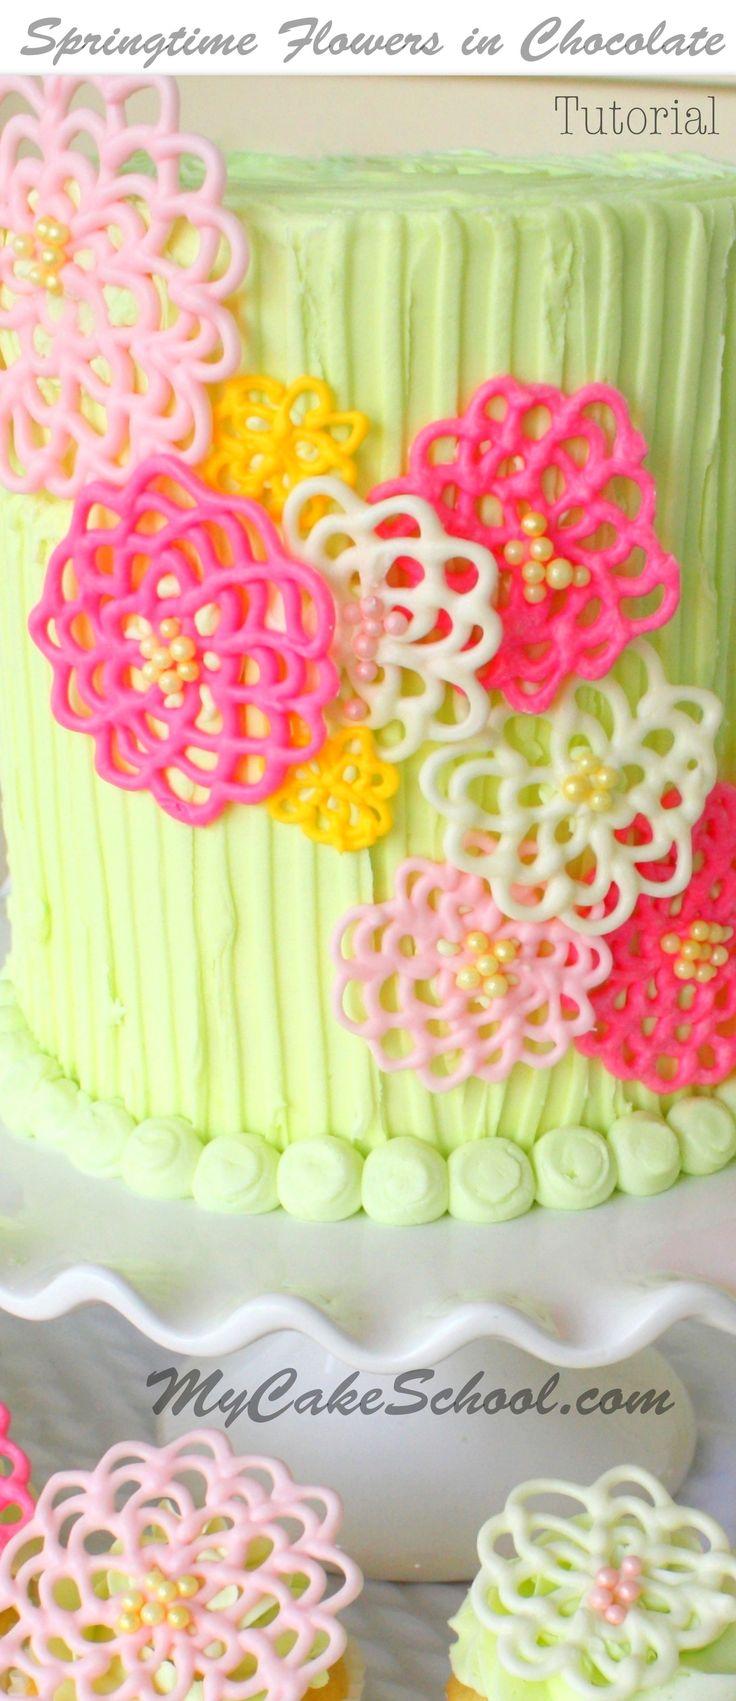 Springtime Flowers in Chocolate- A Cake Decorating Blog Tutorial! by MyCakeSchool.com! Online Cake Decorating Classes, Tutorials, & Recipes! #cakedecoratingtechniques